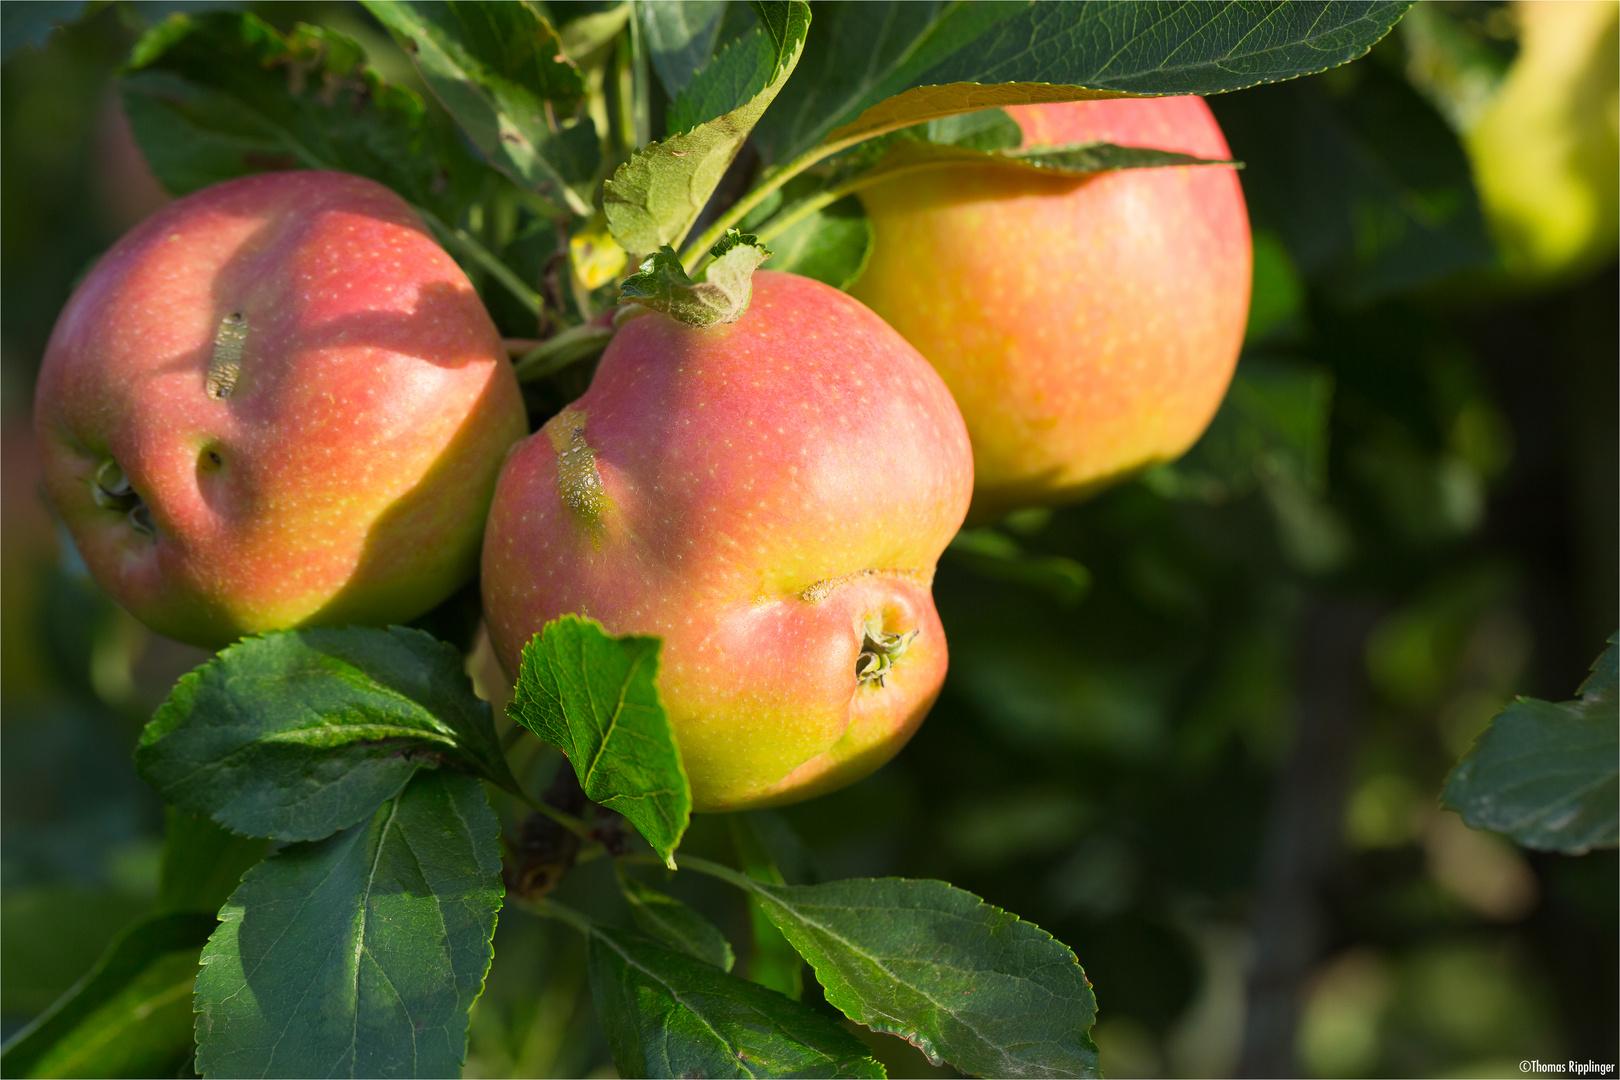 Elstar mit Schaden der Apfelsägewespe (Hoplocampa testudinea).